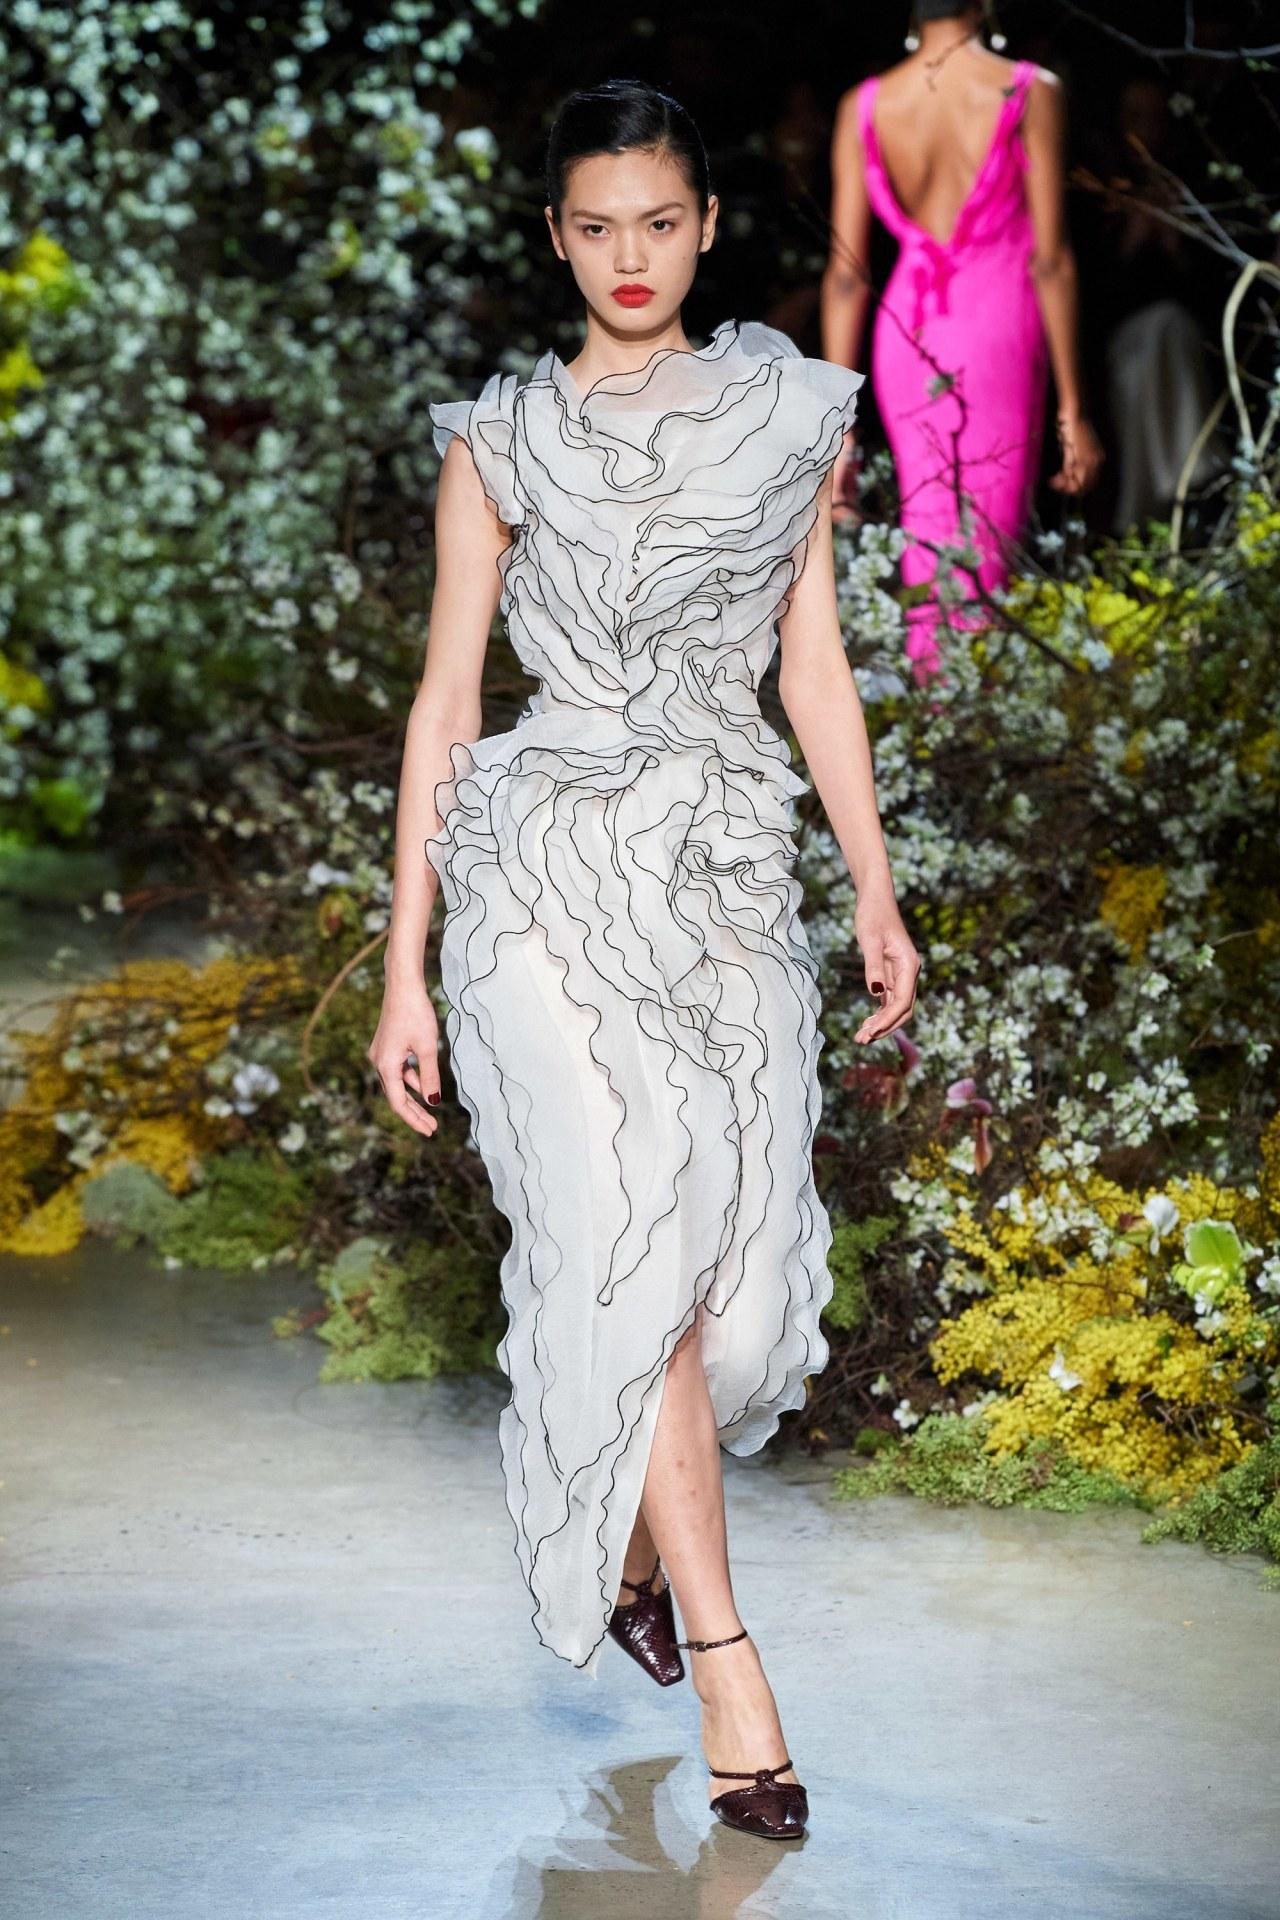 Jason Wu F/W 2020 #fashion#fashion photography#runway#runway model#runway details